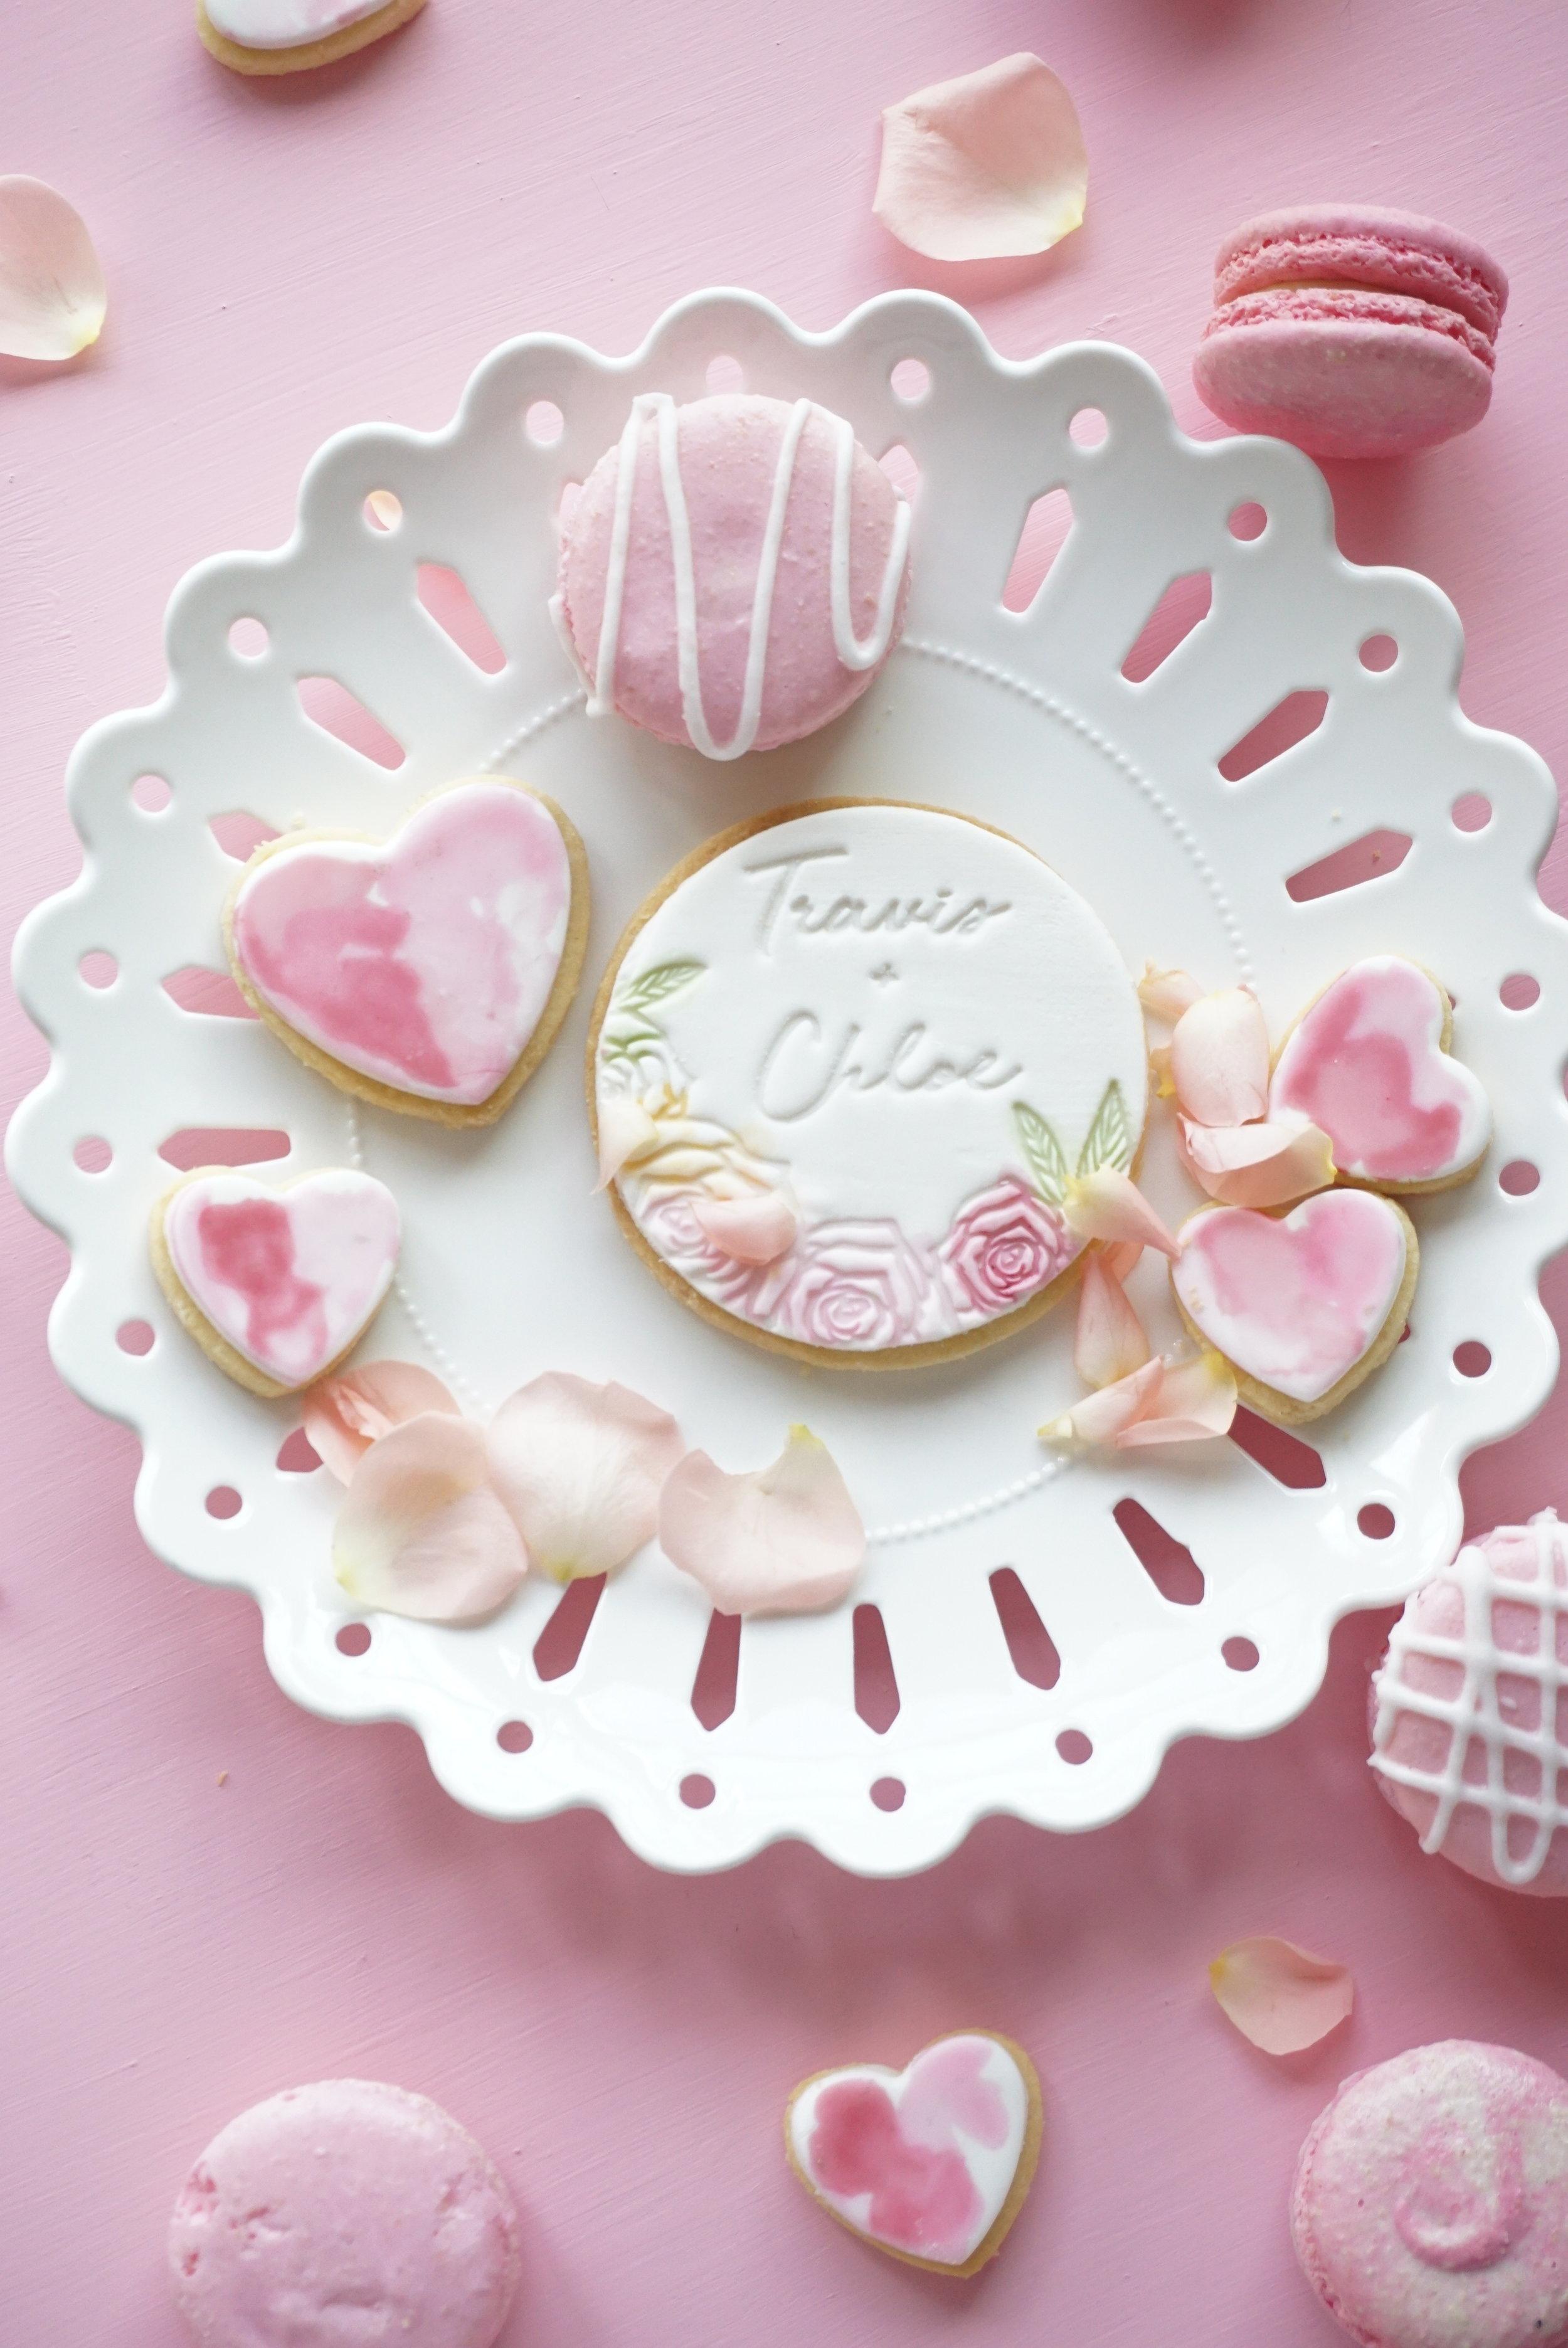 Cakes_By_Aranee_Perth_Drip_Cakes_Custom_Cakes_Wedding_Cakes_Macarons_Cupcakes_Personalised_Cookies_OTHER_DESSERTS_Gallery3.JPG